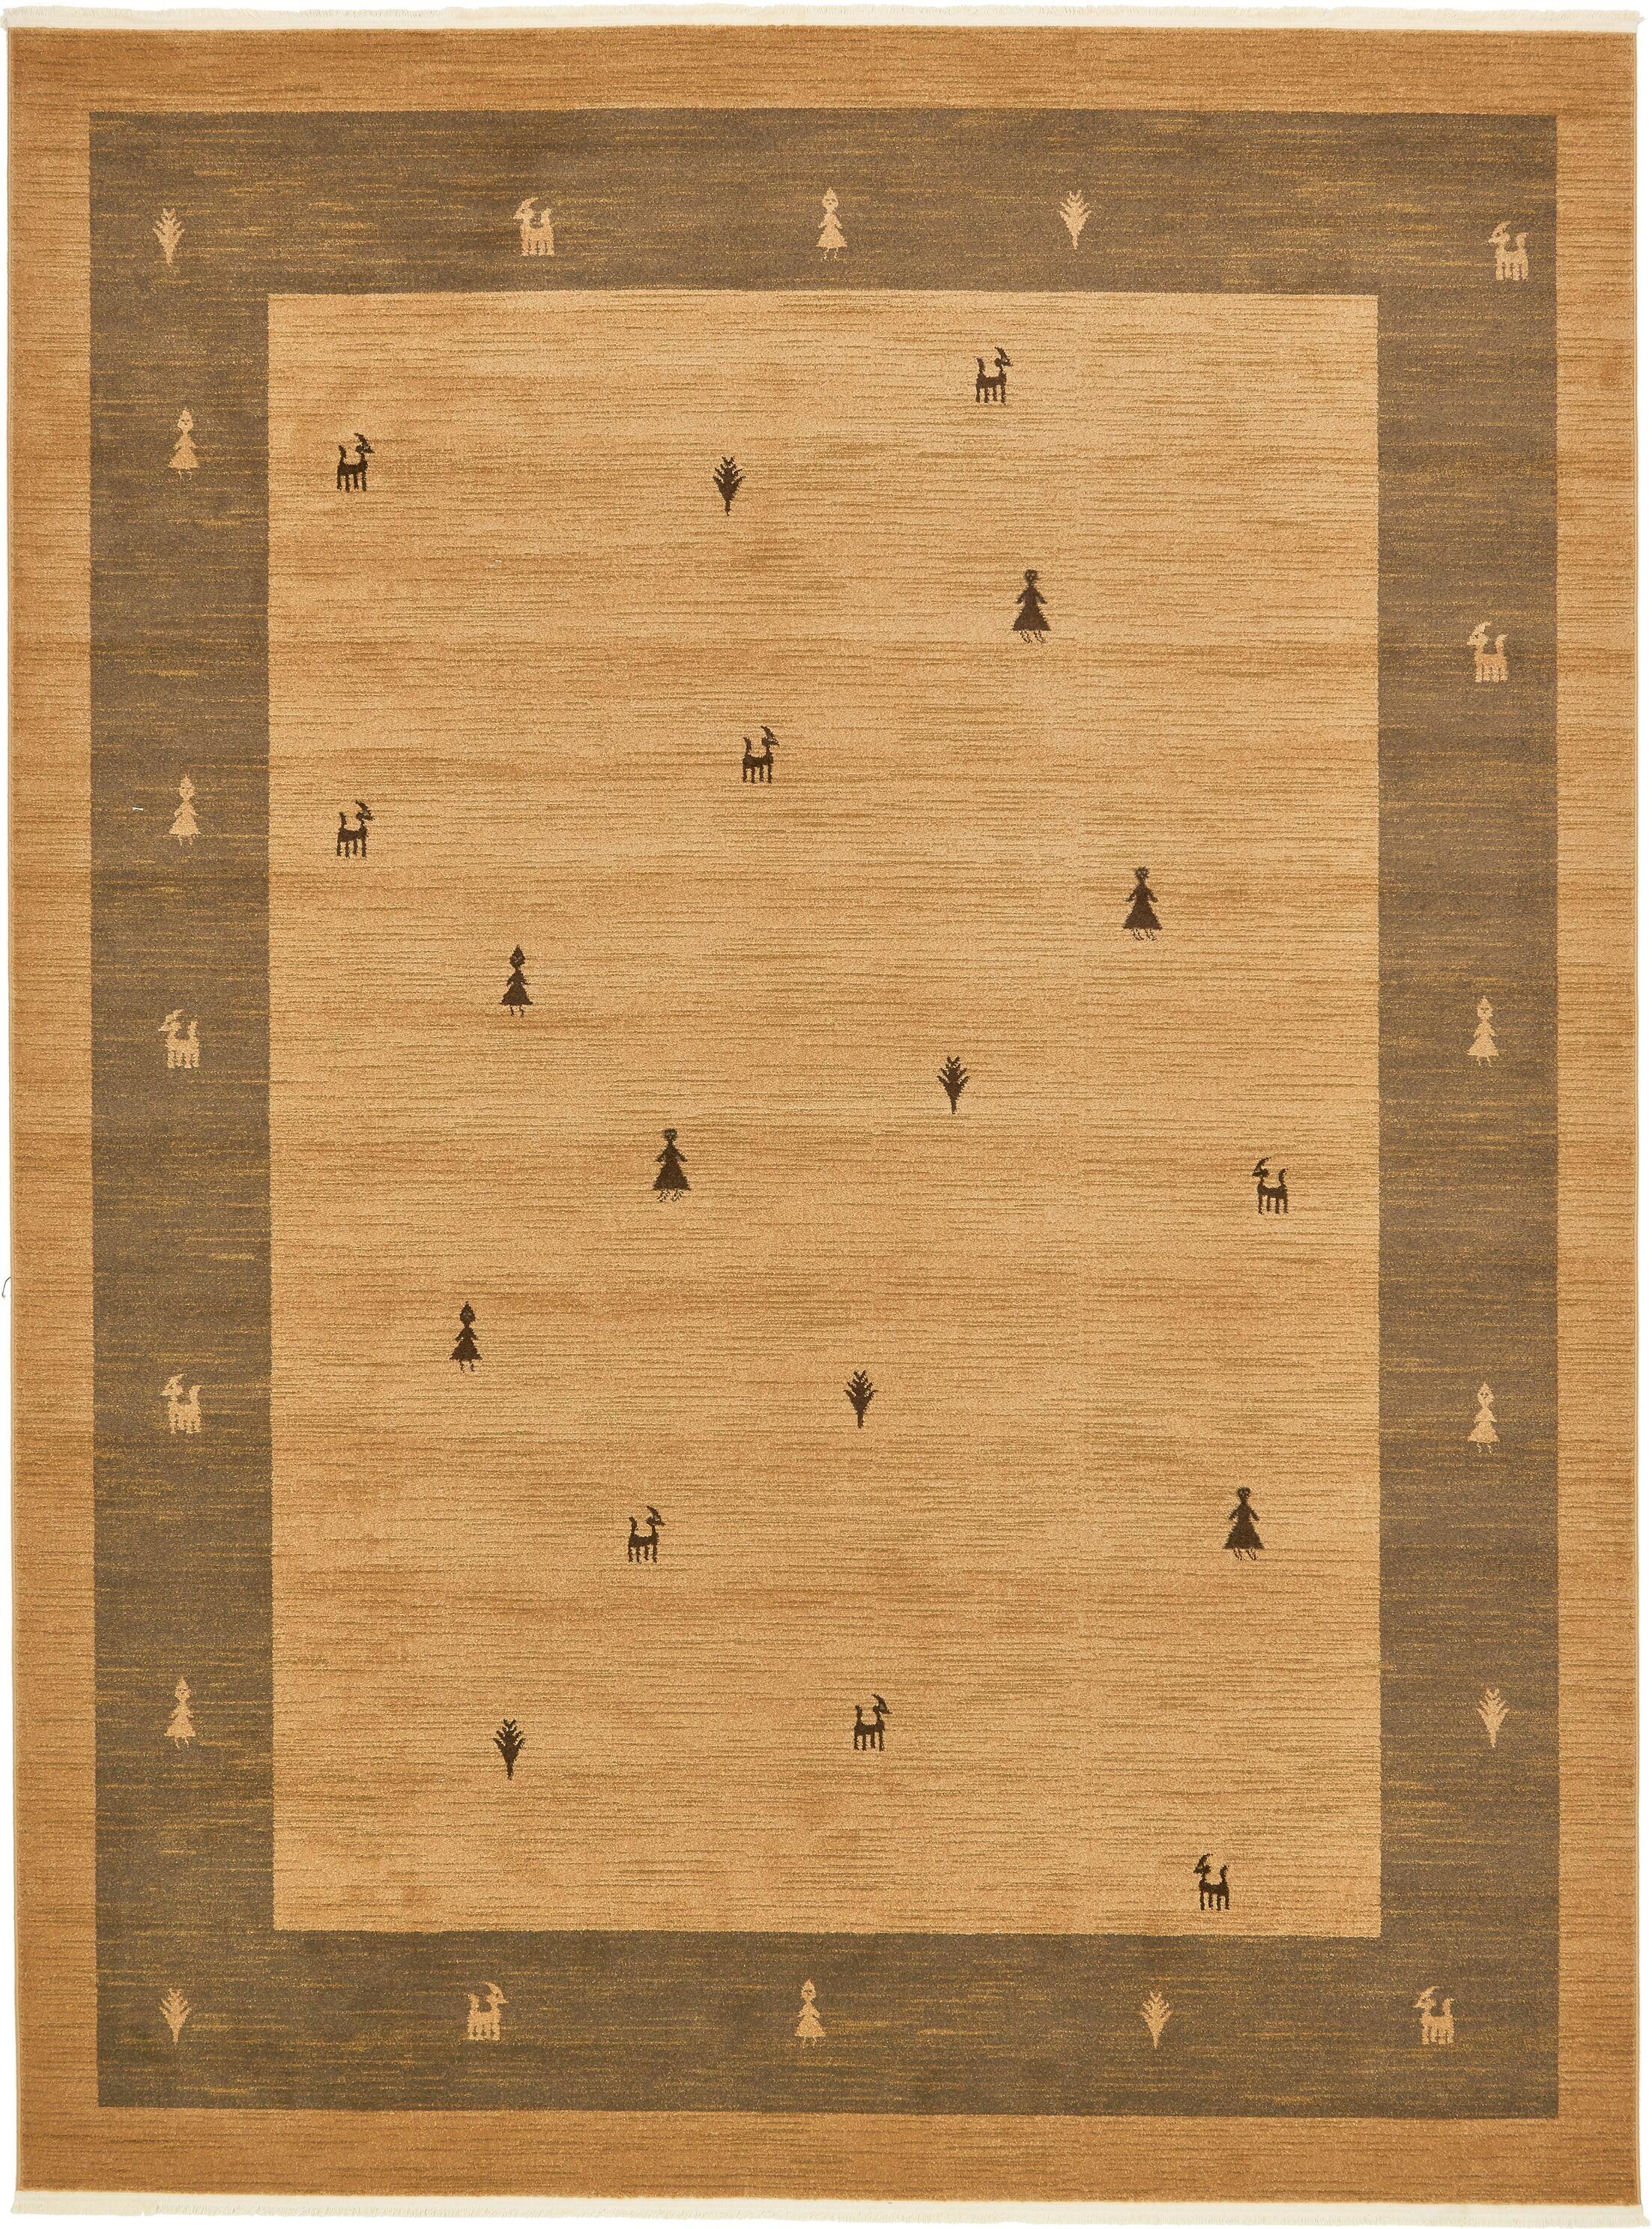 Jan Traditional Tan Area Rug Rug Size: Rectangle 10' x 13'